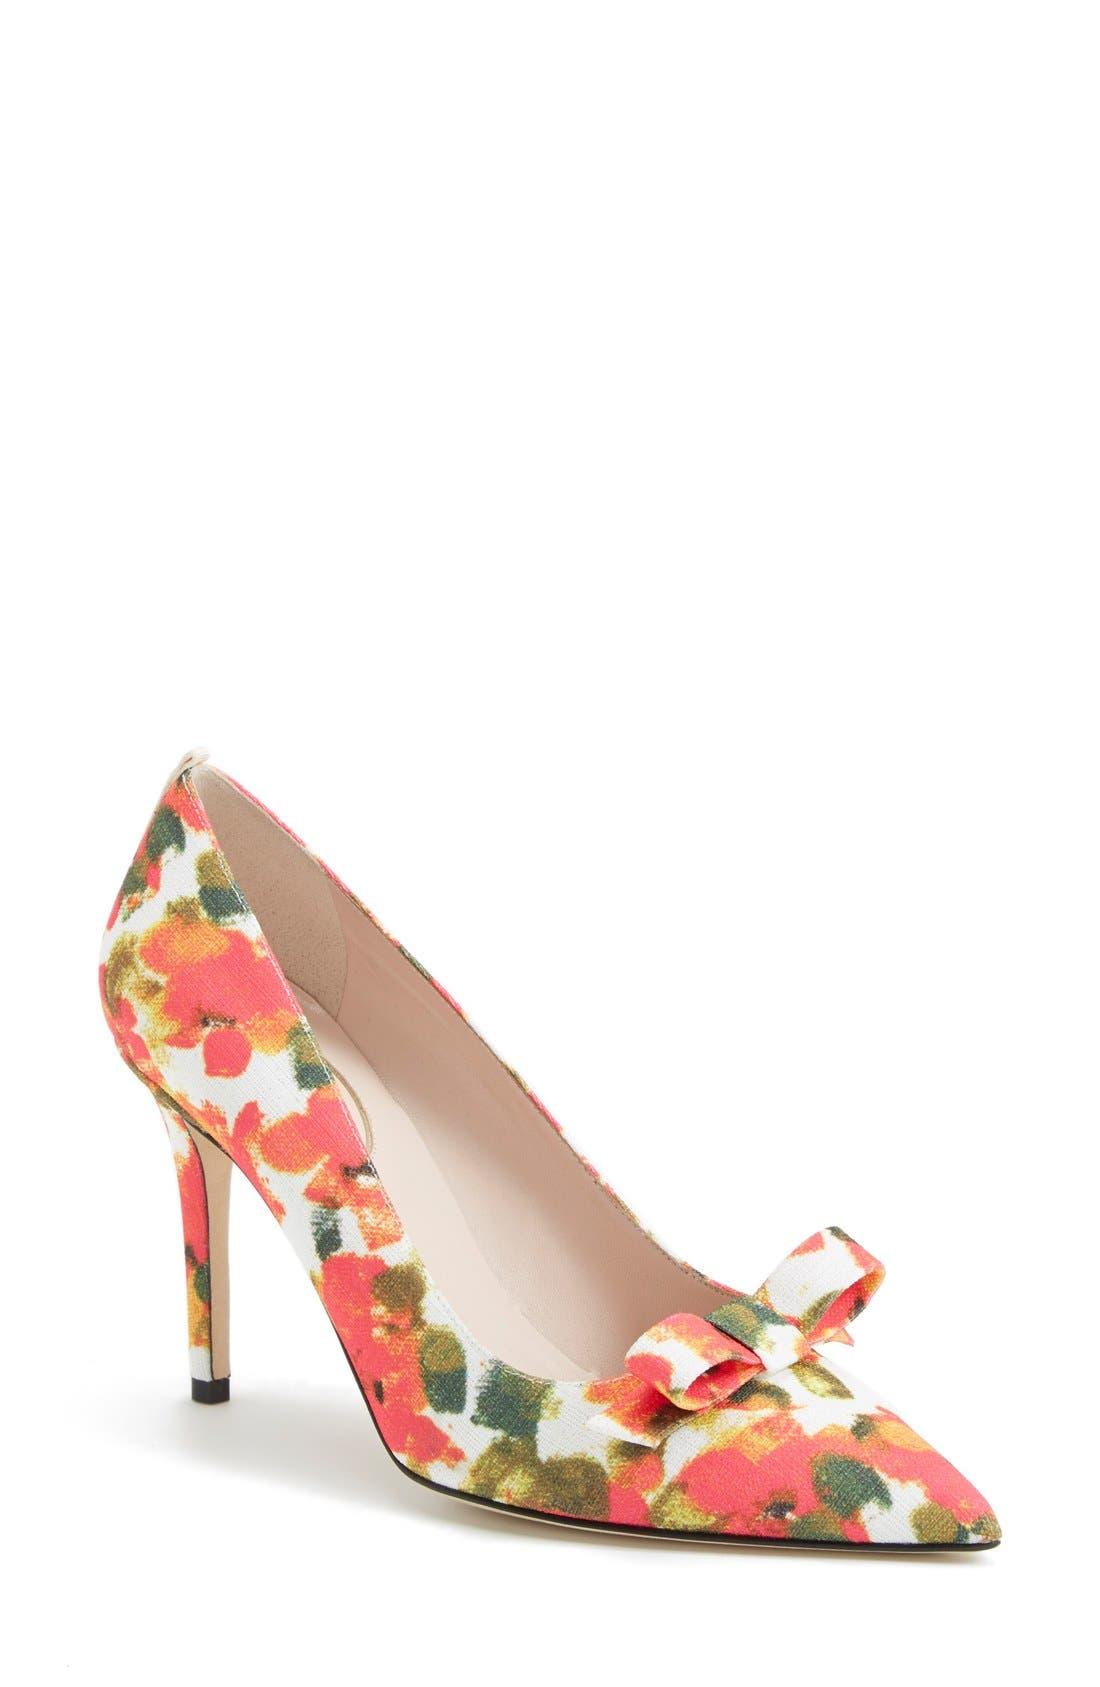 SJP 'Sister' Pointy Toe Pump,                         Main,                         color, Floral Print